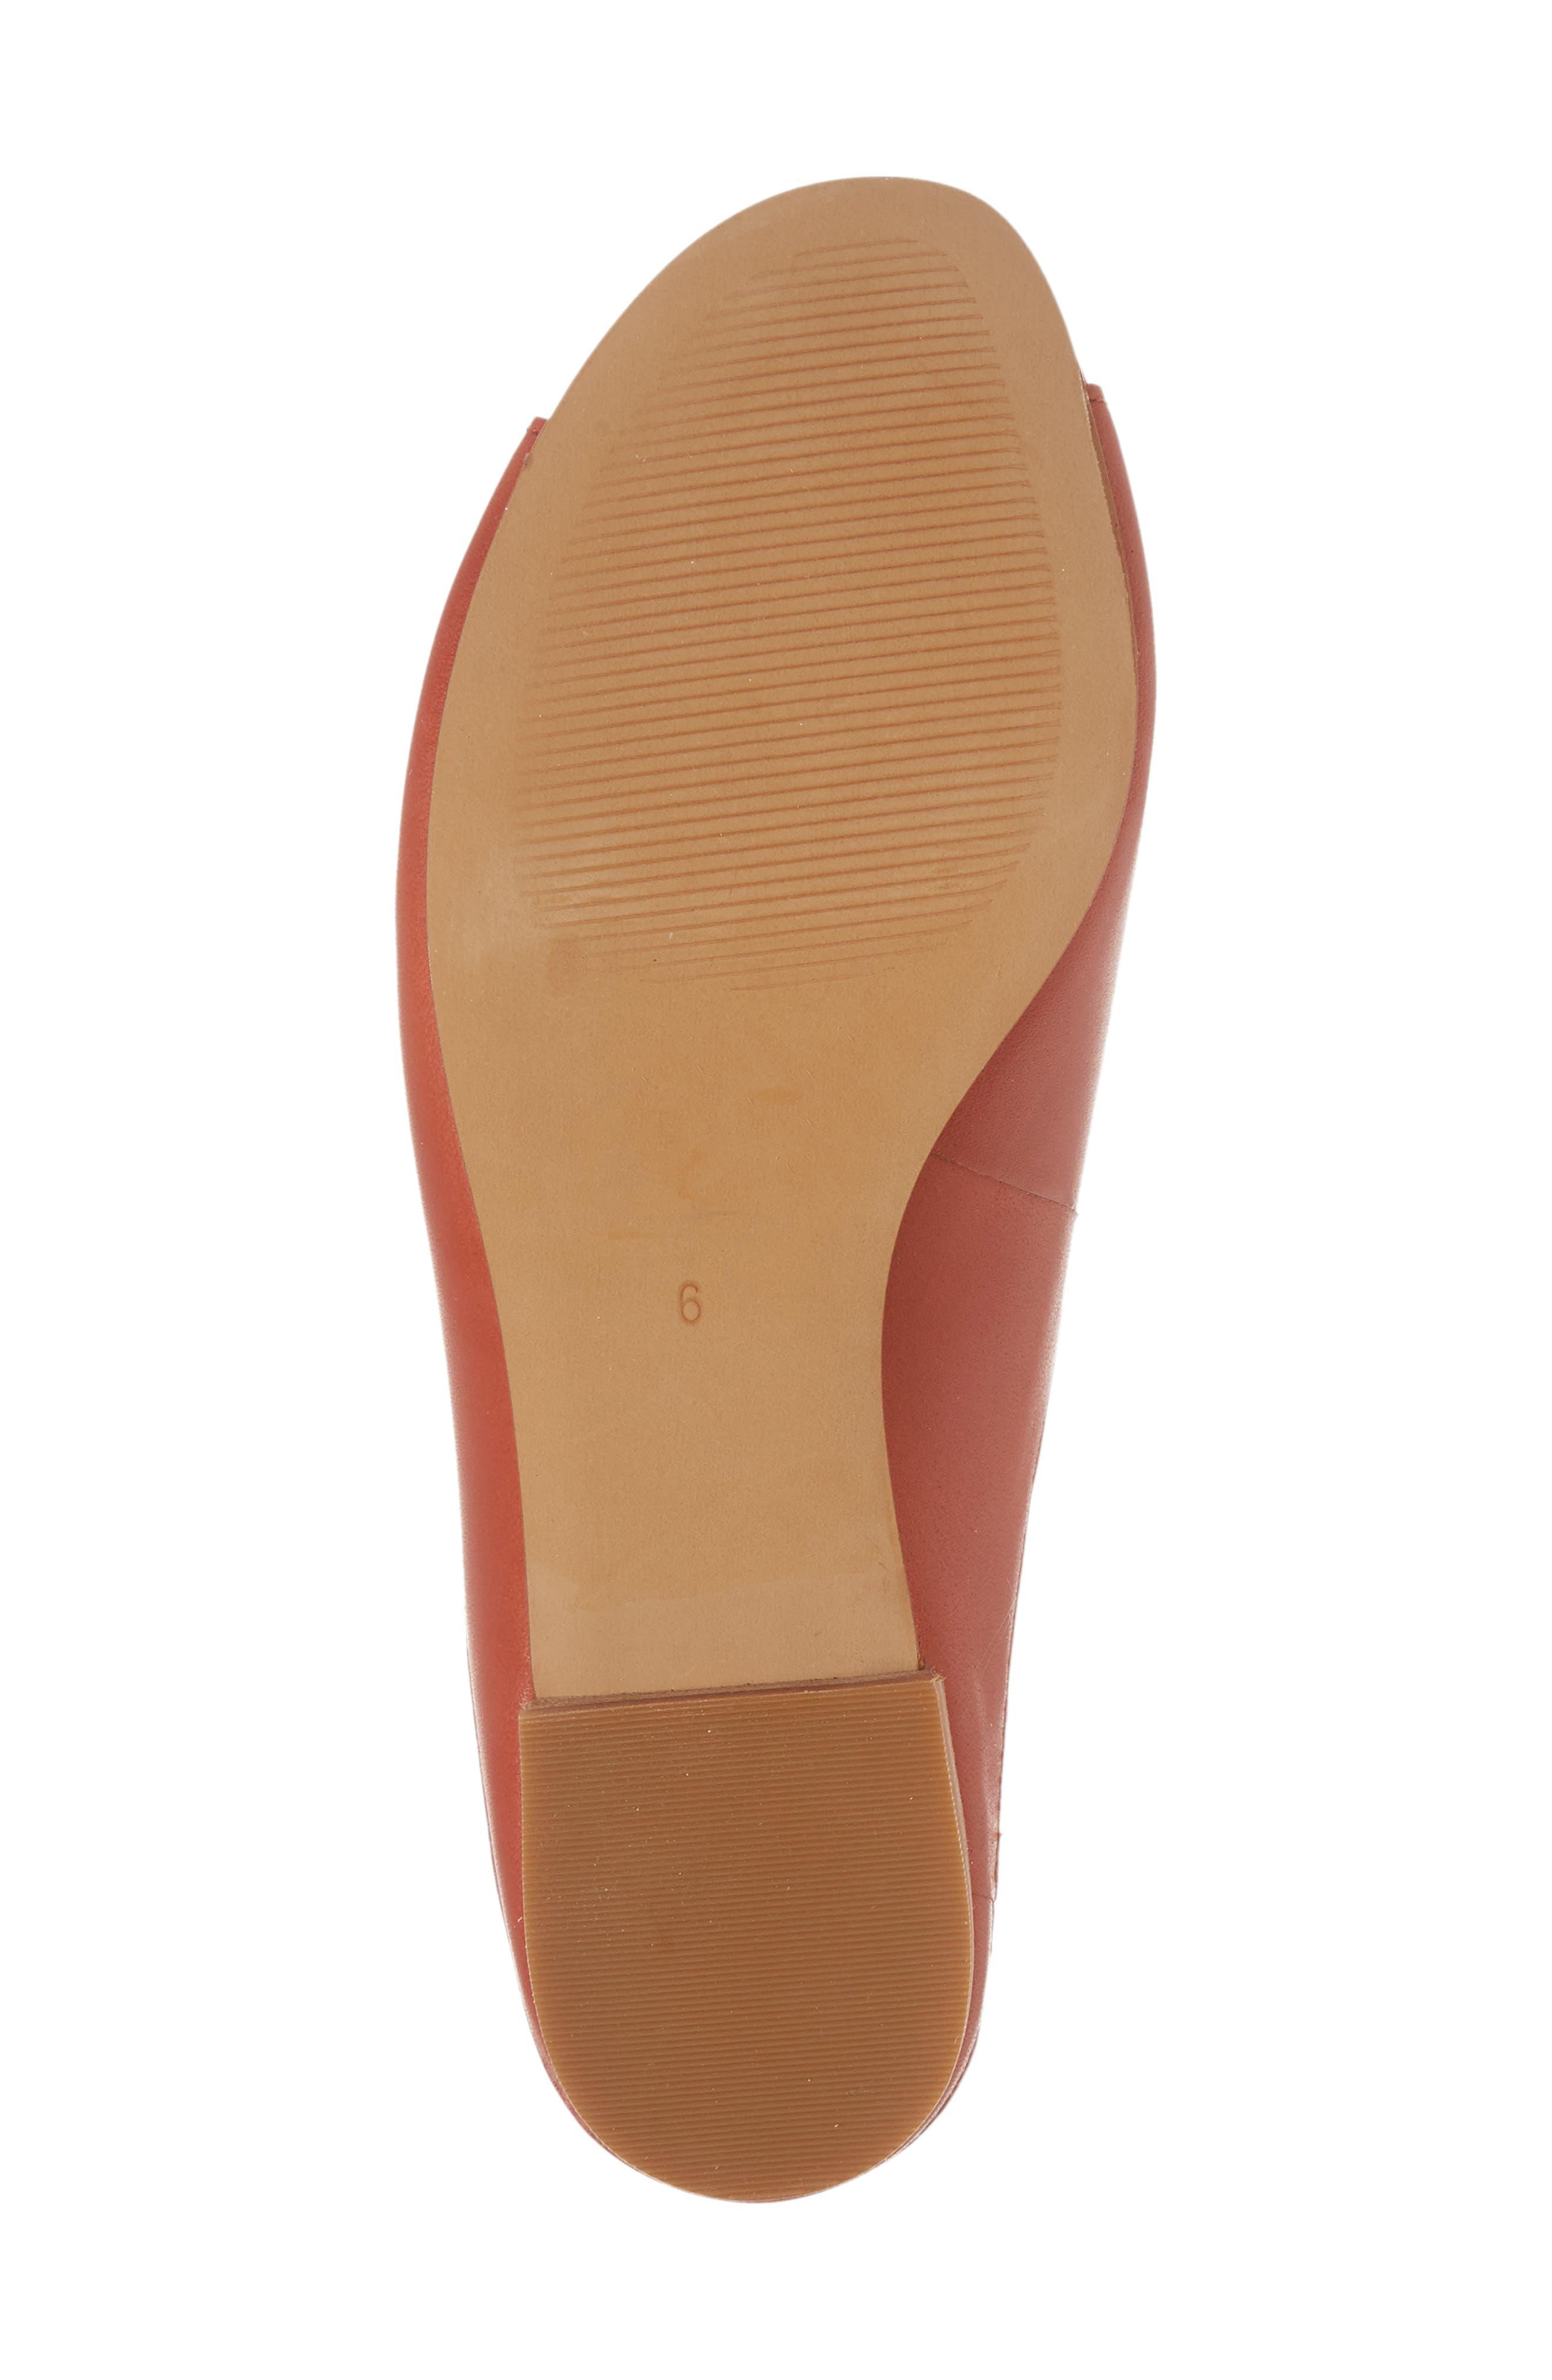 Tavi Slide Sandal,                             Alternate thumbnail 6, color,                             Dark Cinnabar Leather